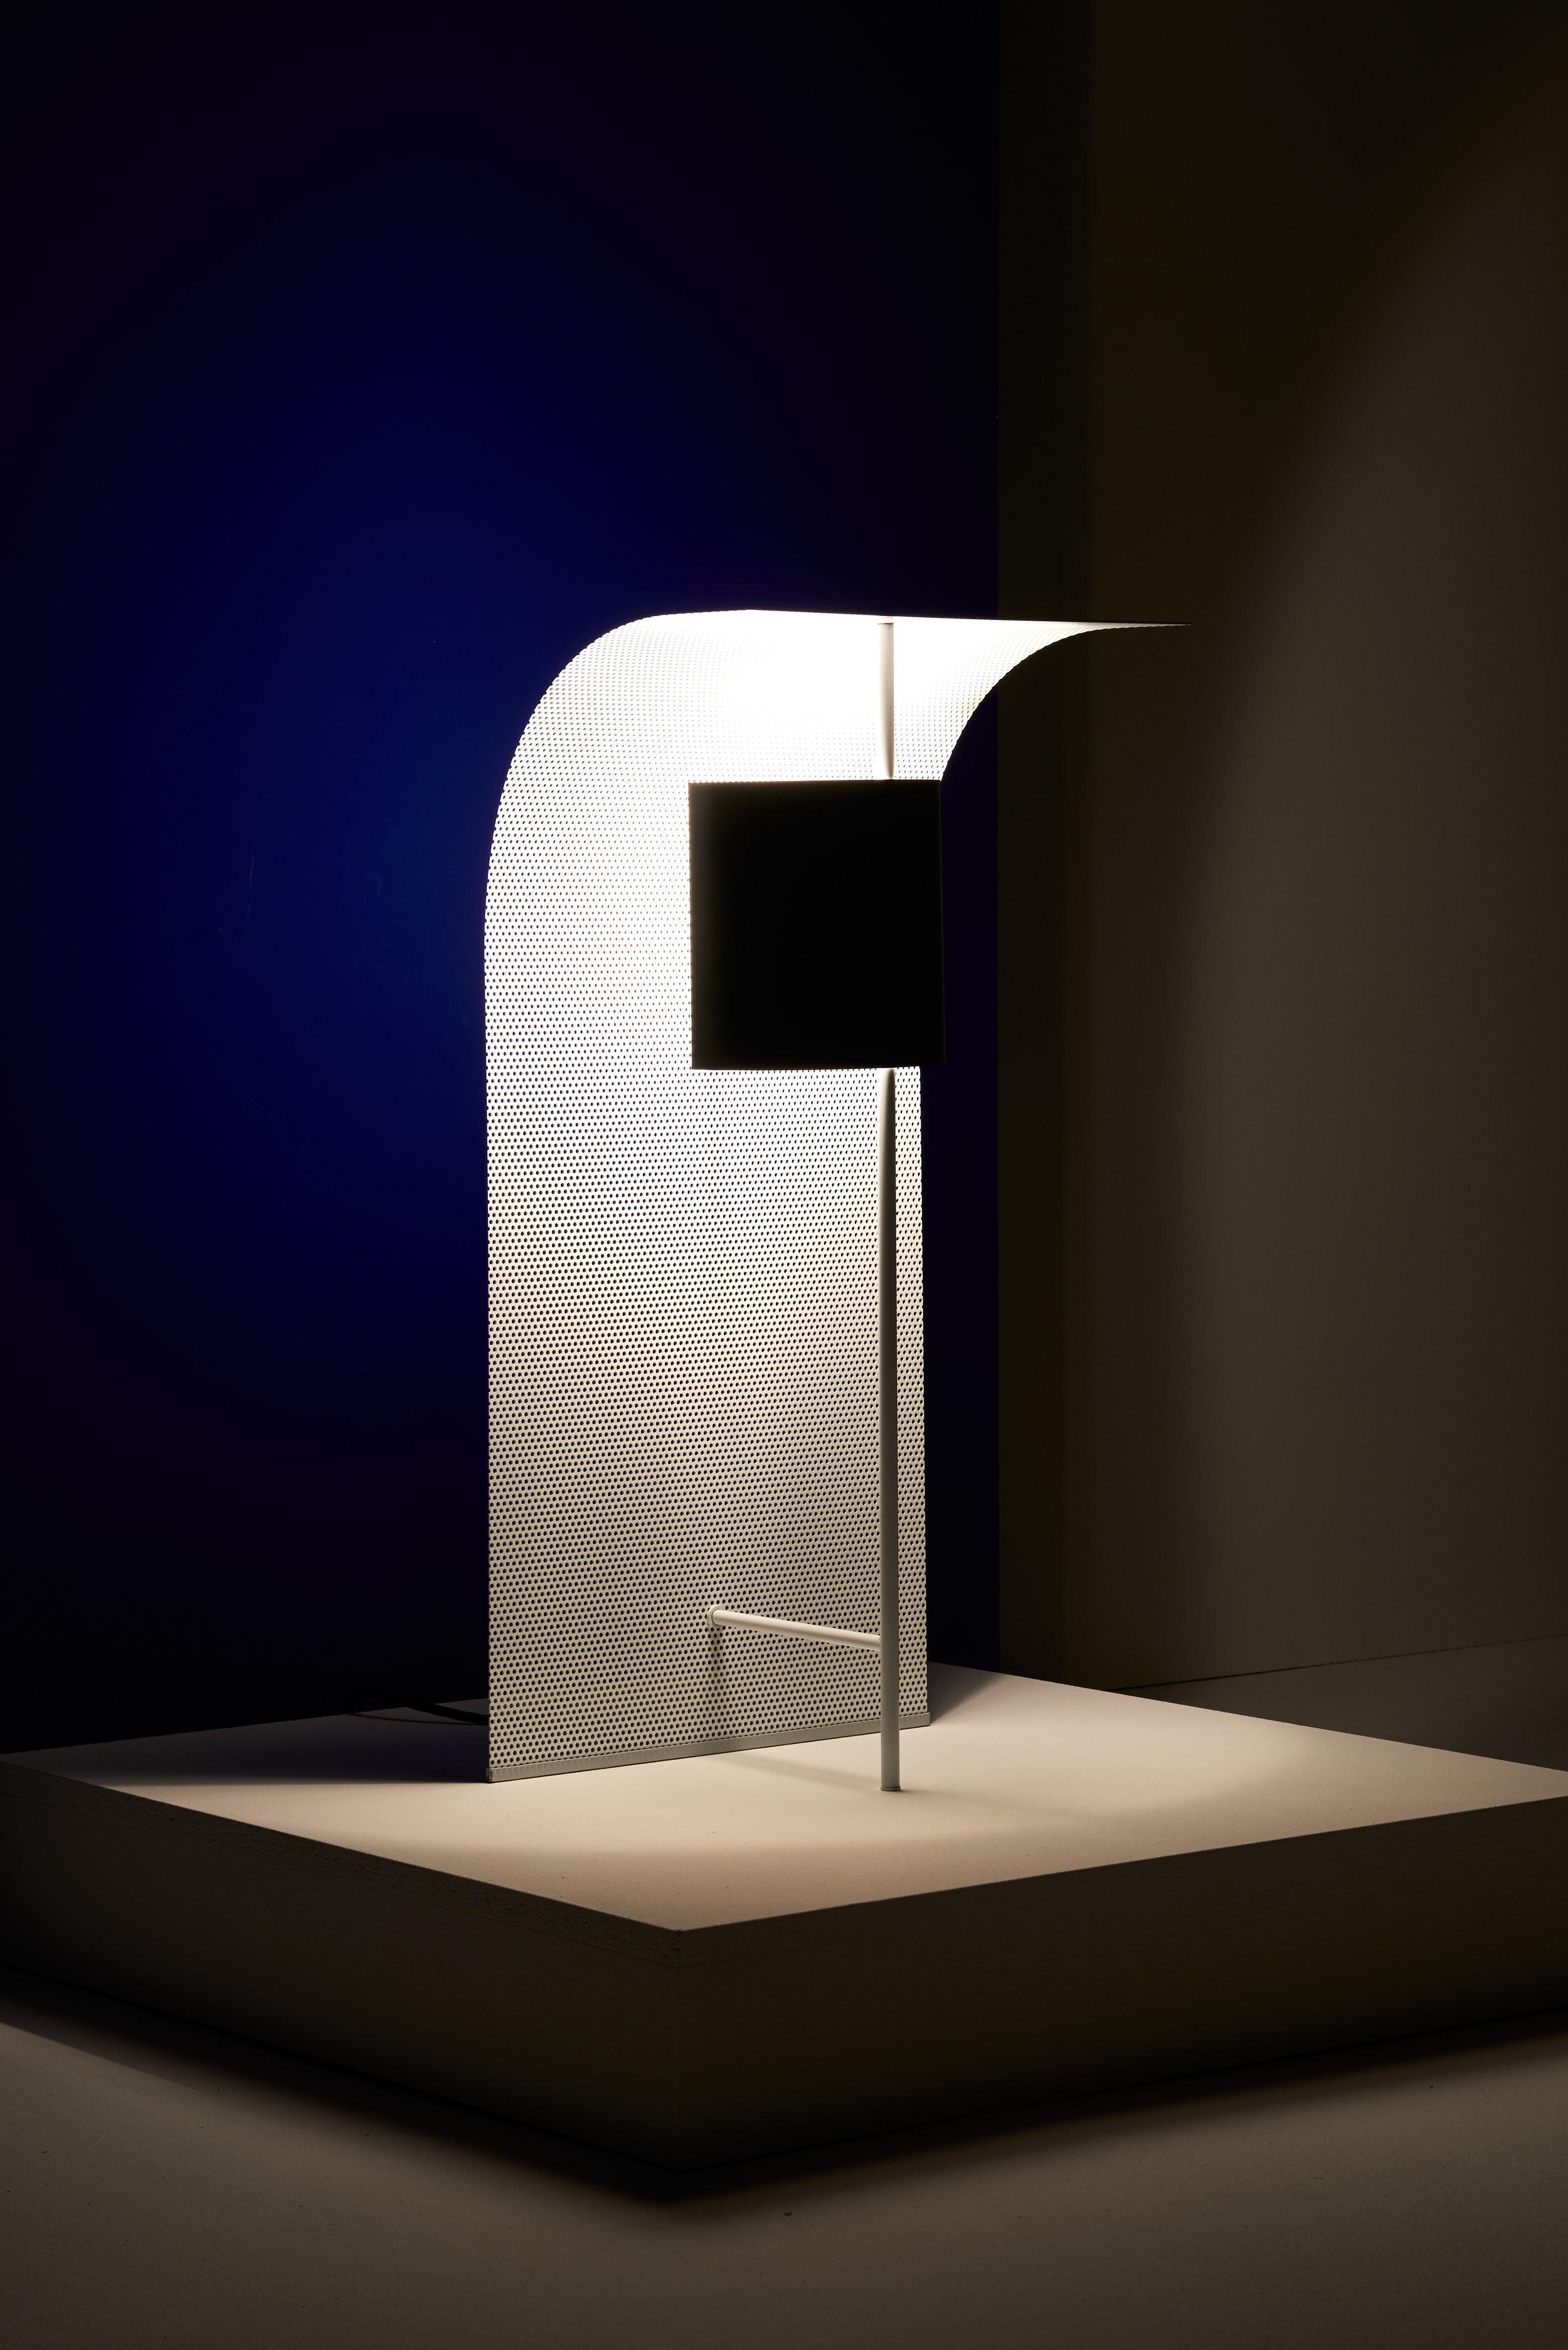 Veil_Collection_Frederik_Kurzweg_Design_Studio_10.jpg